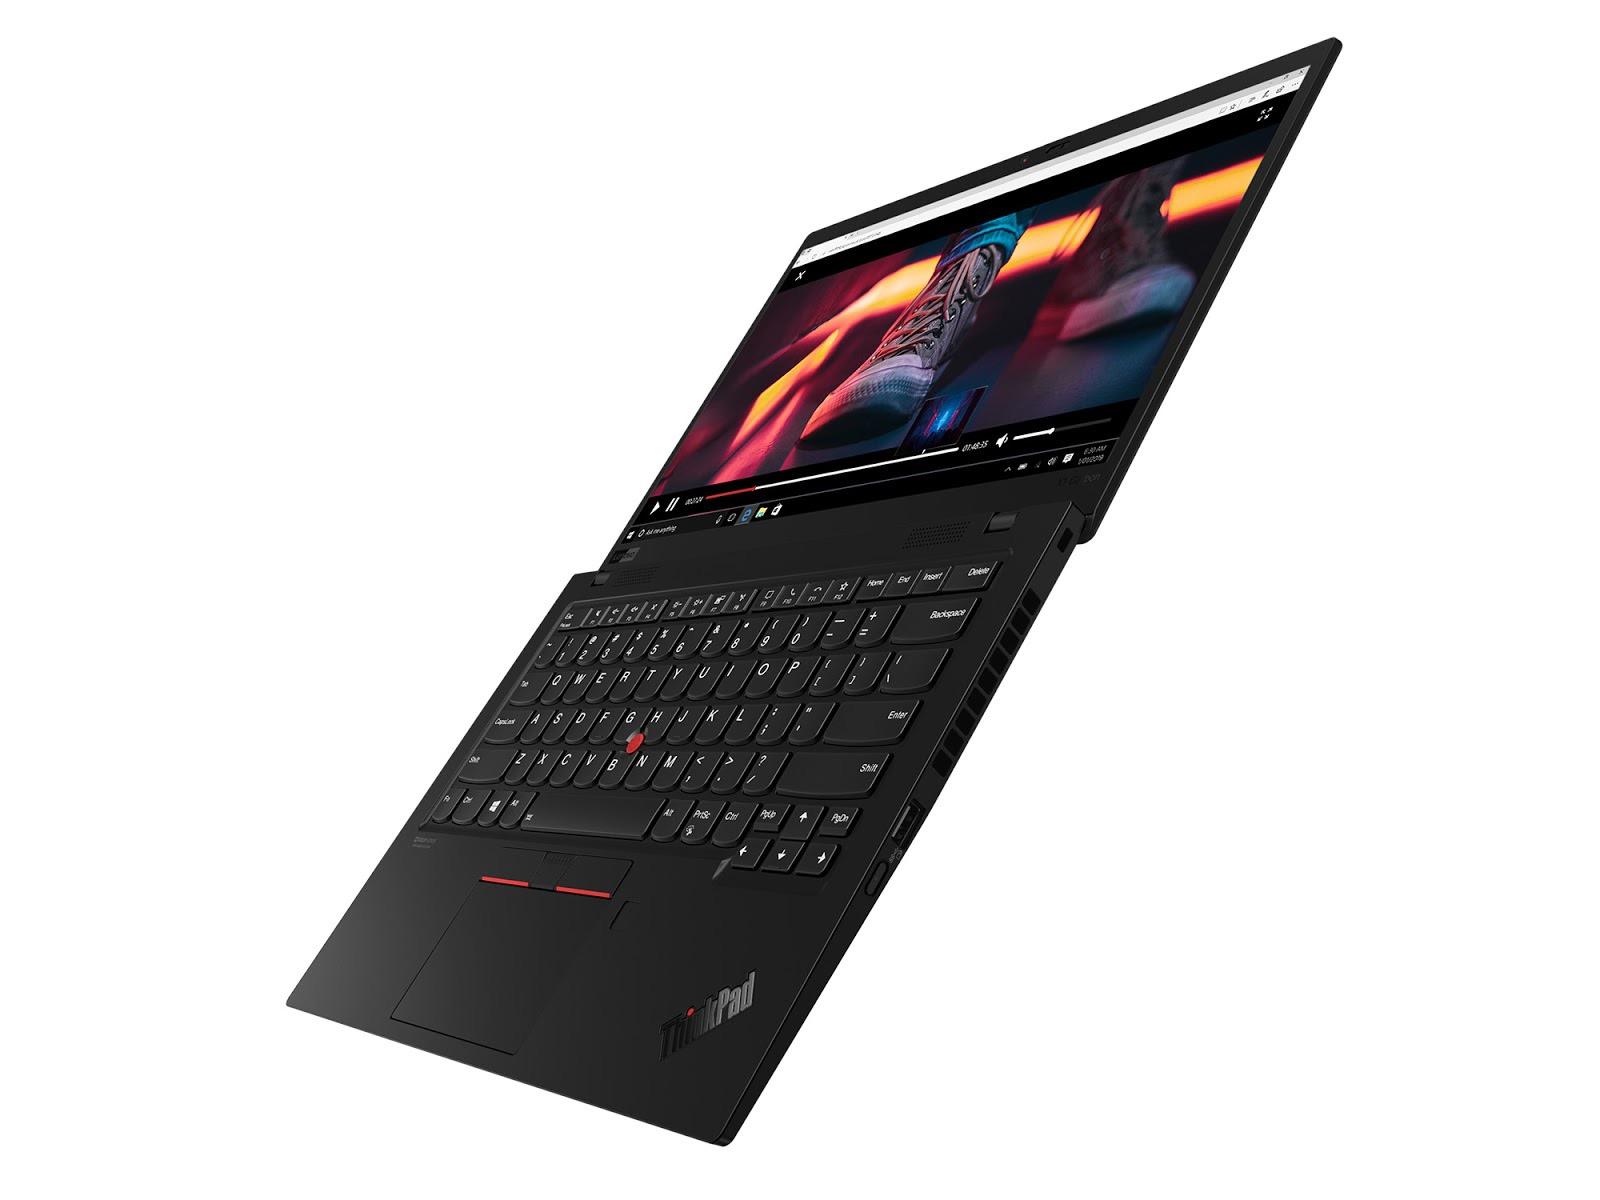 Фото 1. Ноутбук Lenovo ThinkPad X1 Carbon Gen 8 Black (20U90006RT)